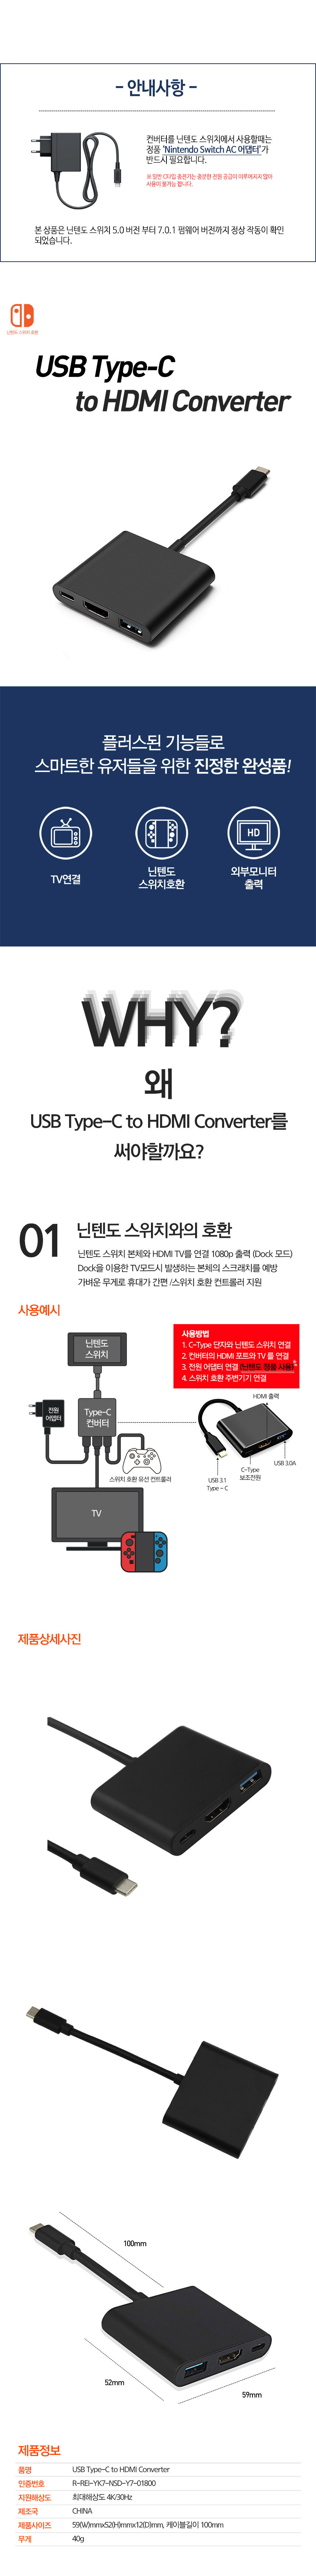 mnk_USB-Type-C-to-HDMI-Converter.jpg